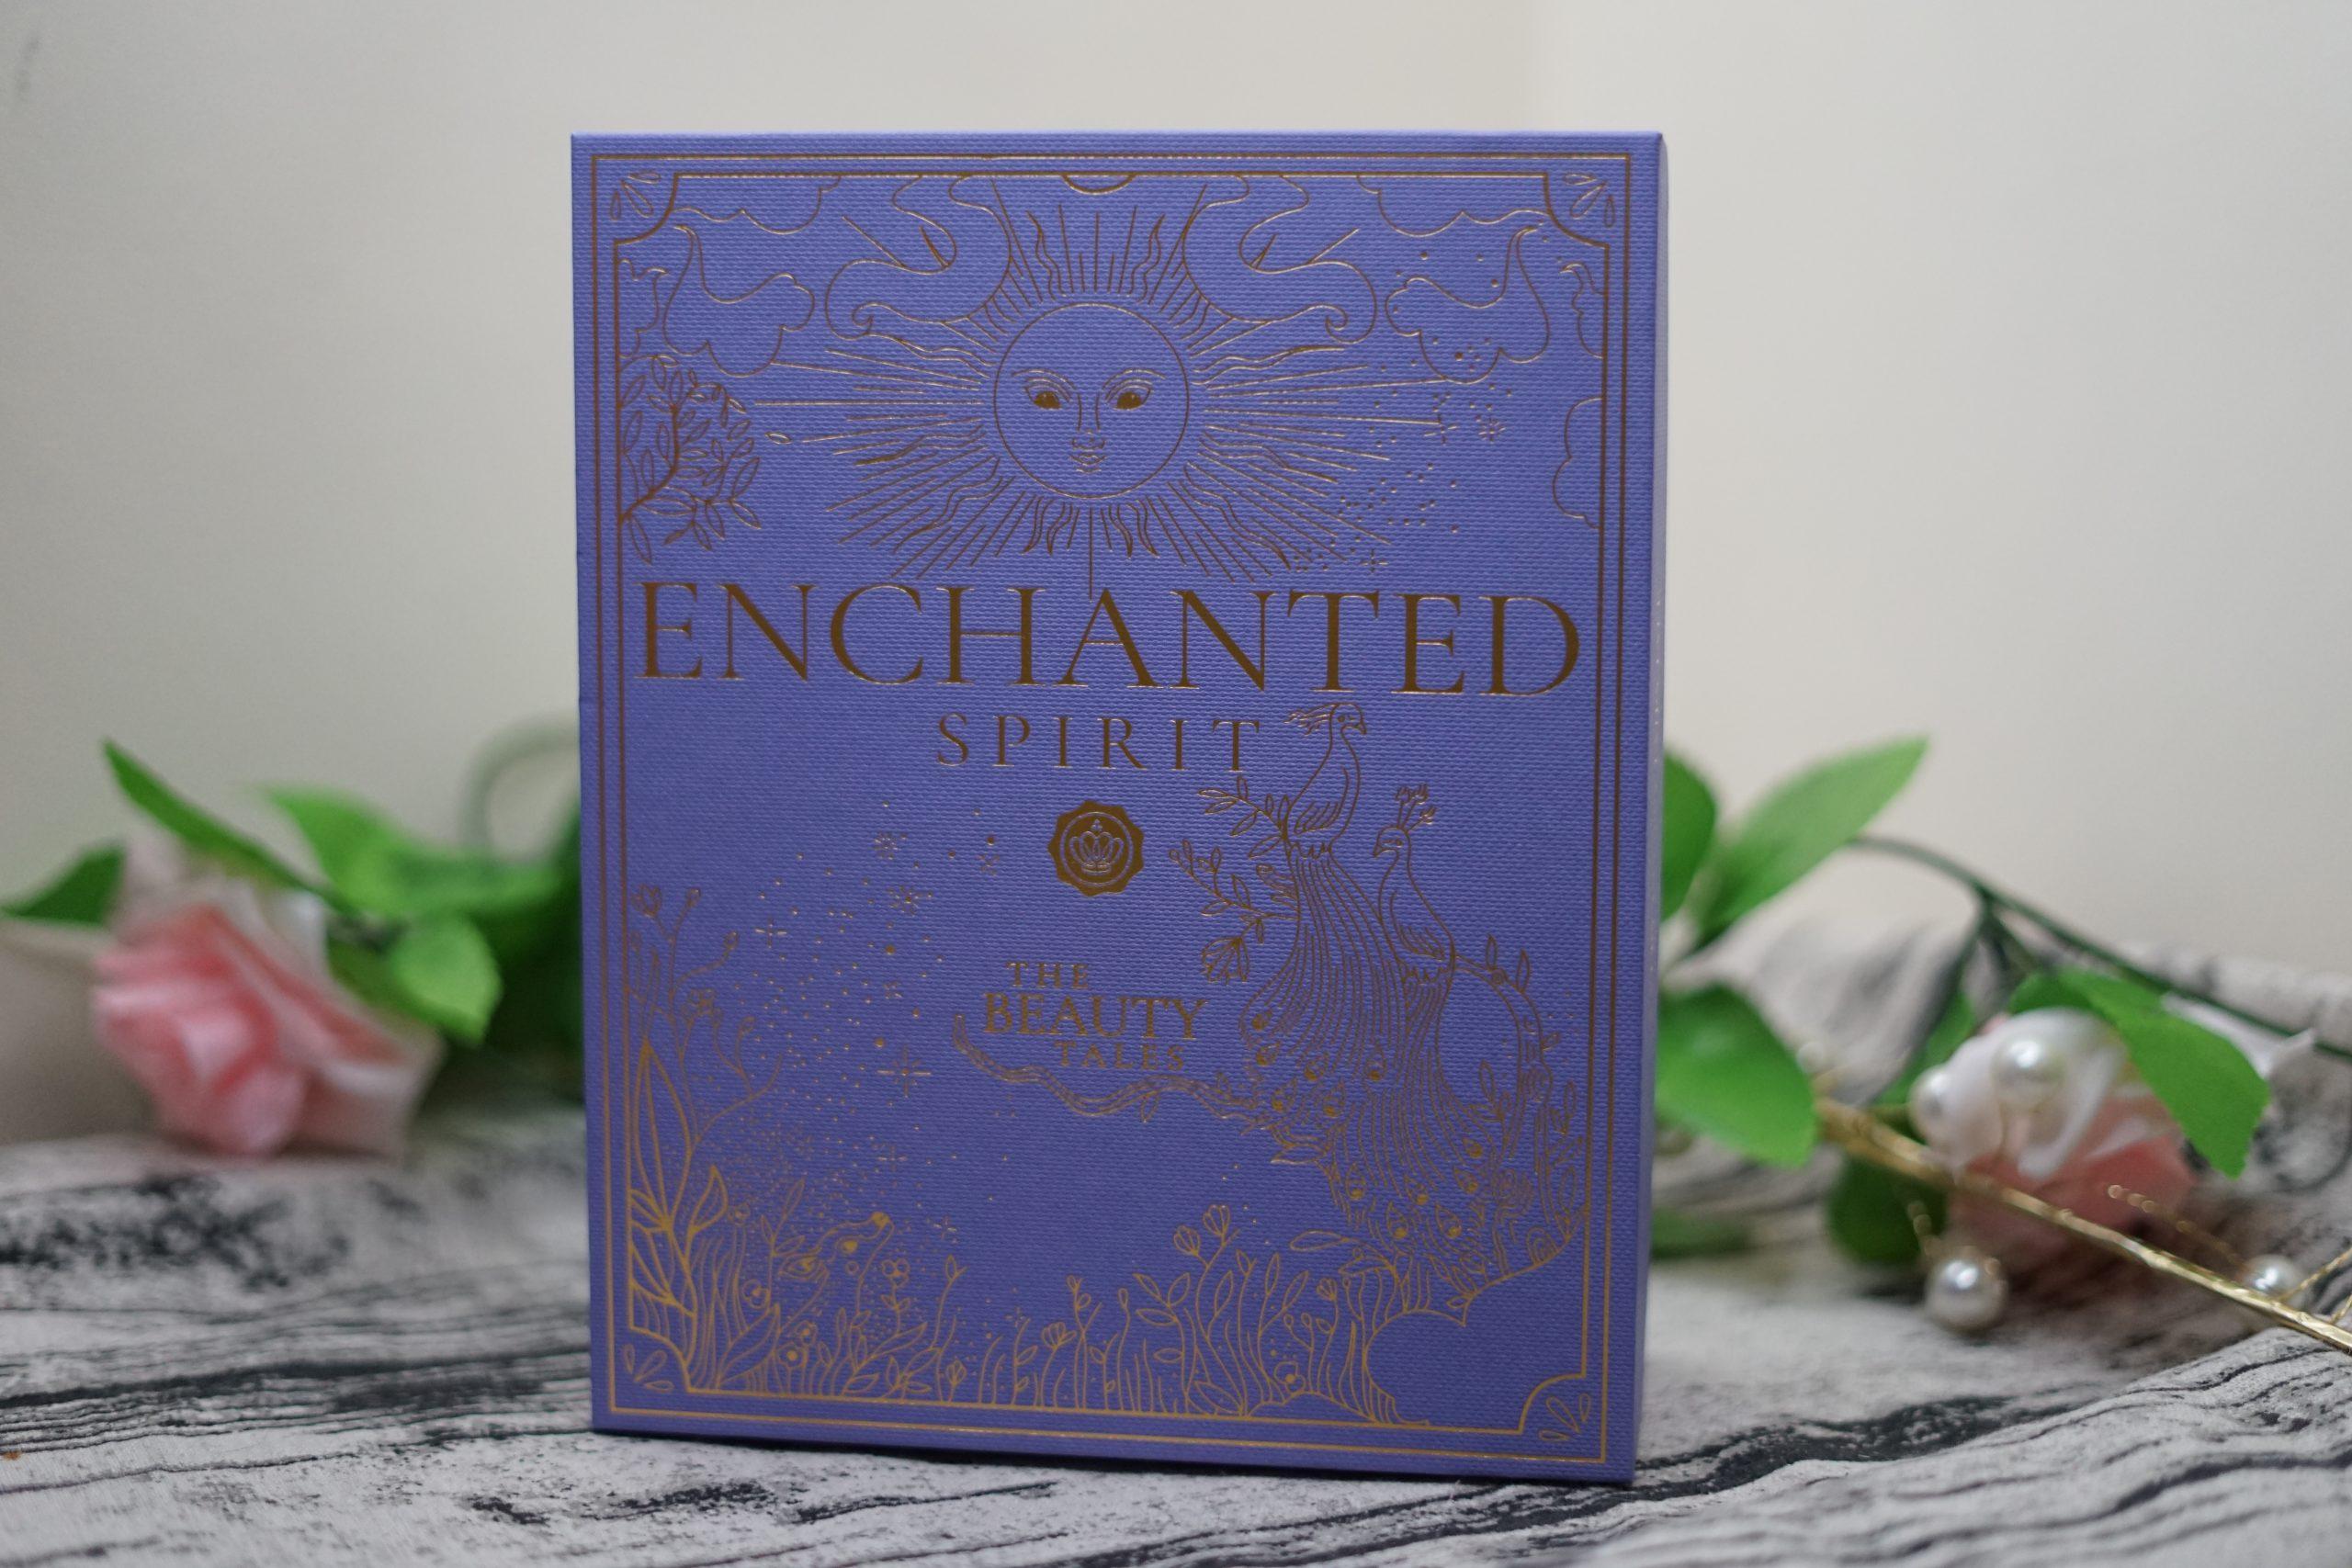 Glossybox October 2020 - Enchanted Spirit